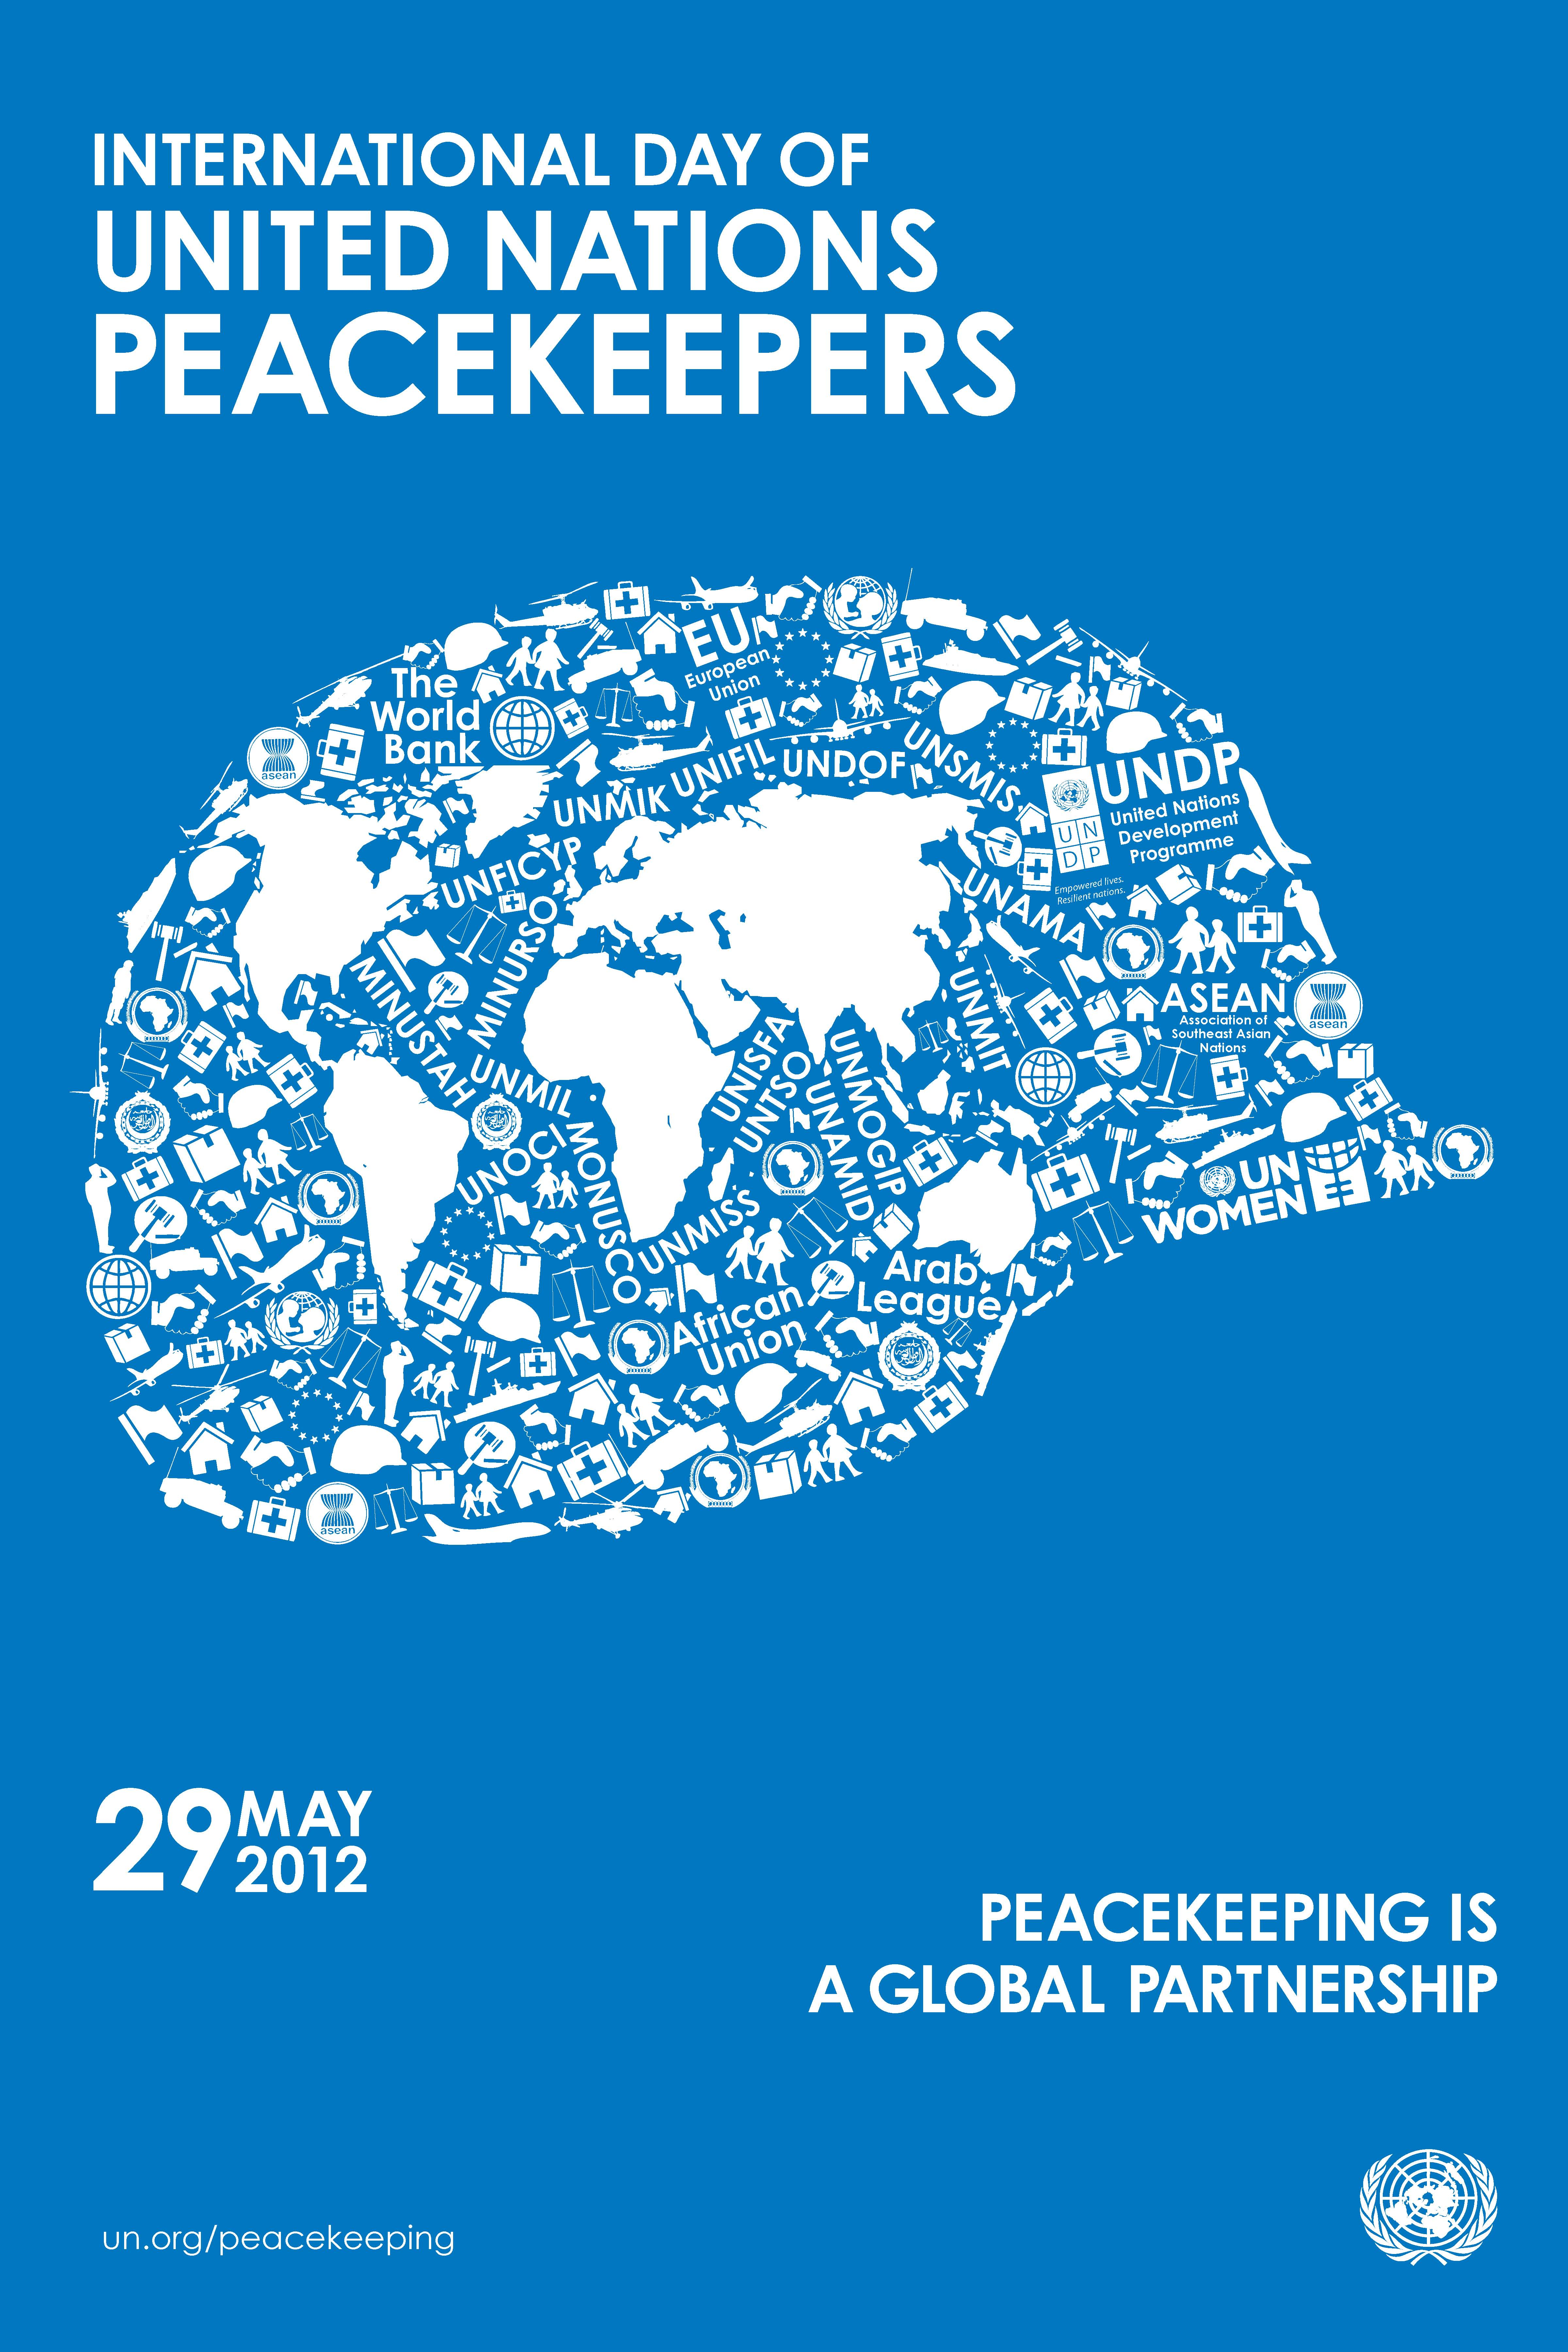 International Day of UN Peacekeepers | UNMIL